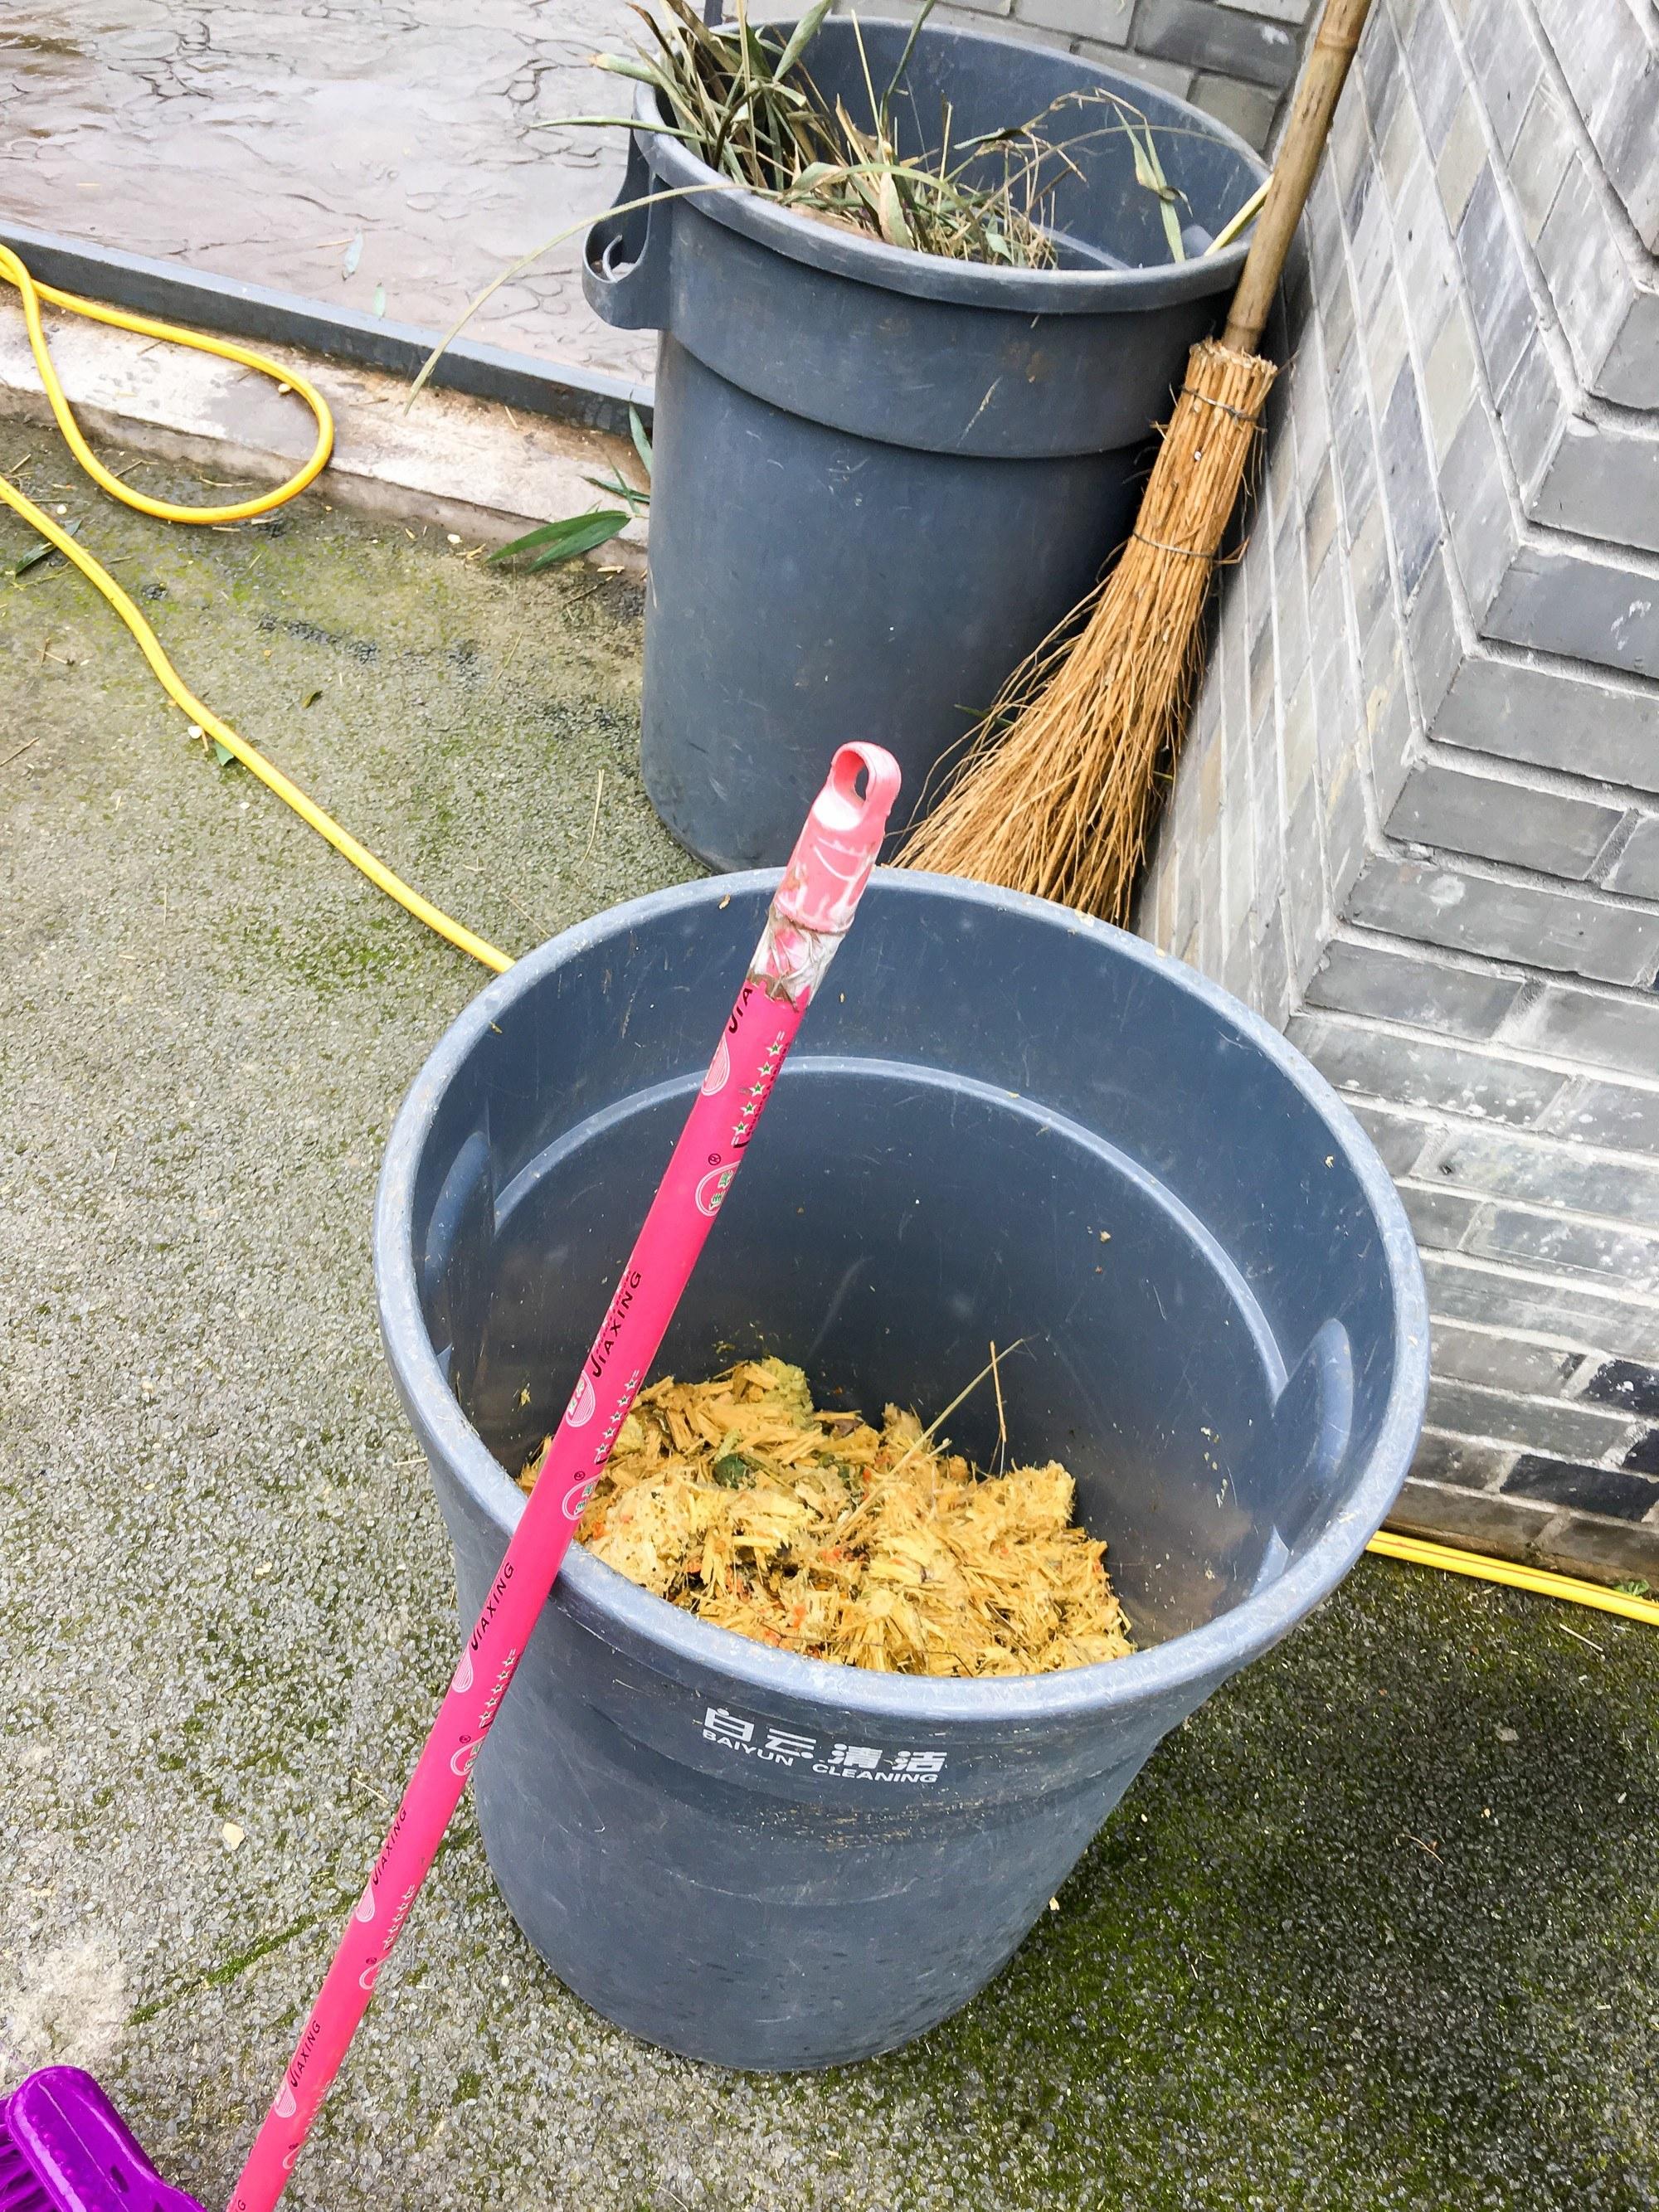 Cleaning panda poop at Dujiangyan Panda Base in China